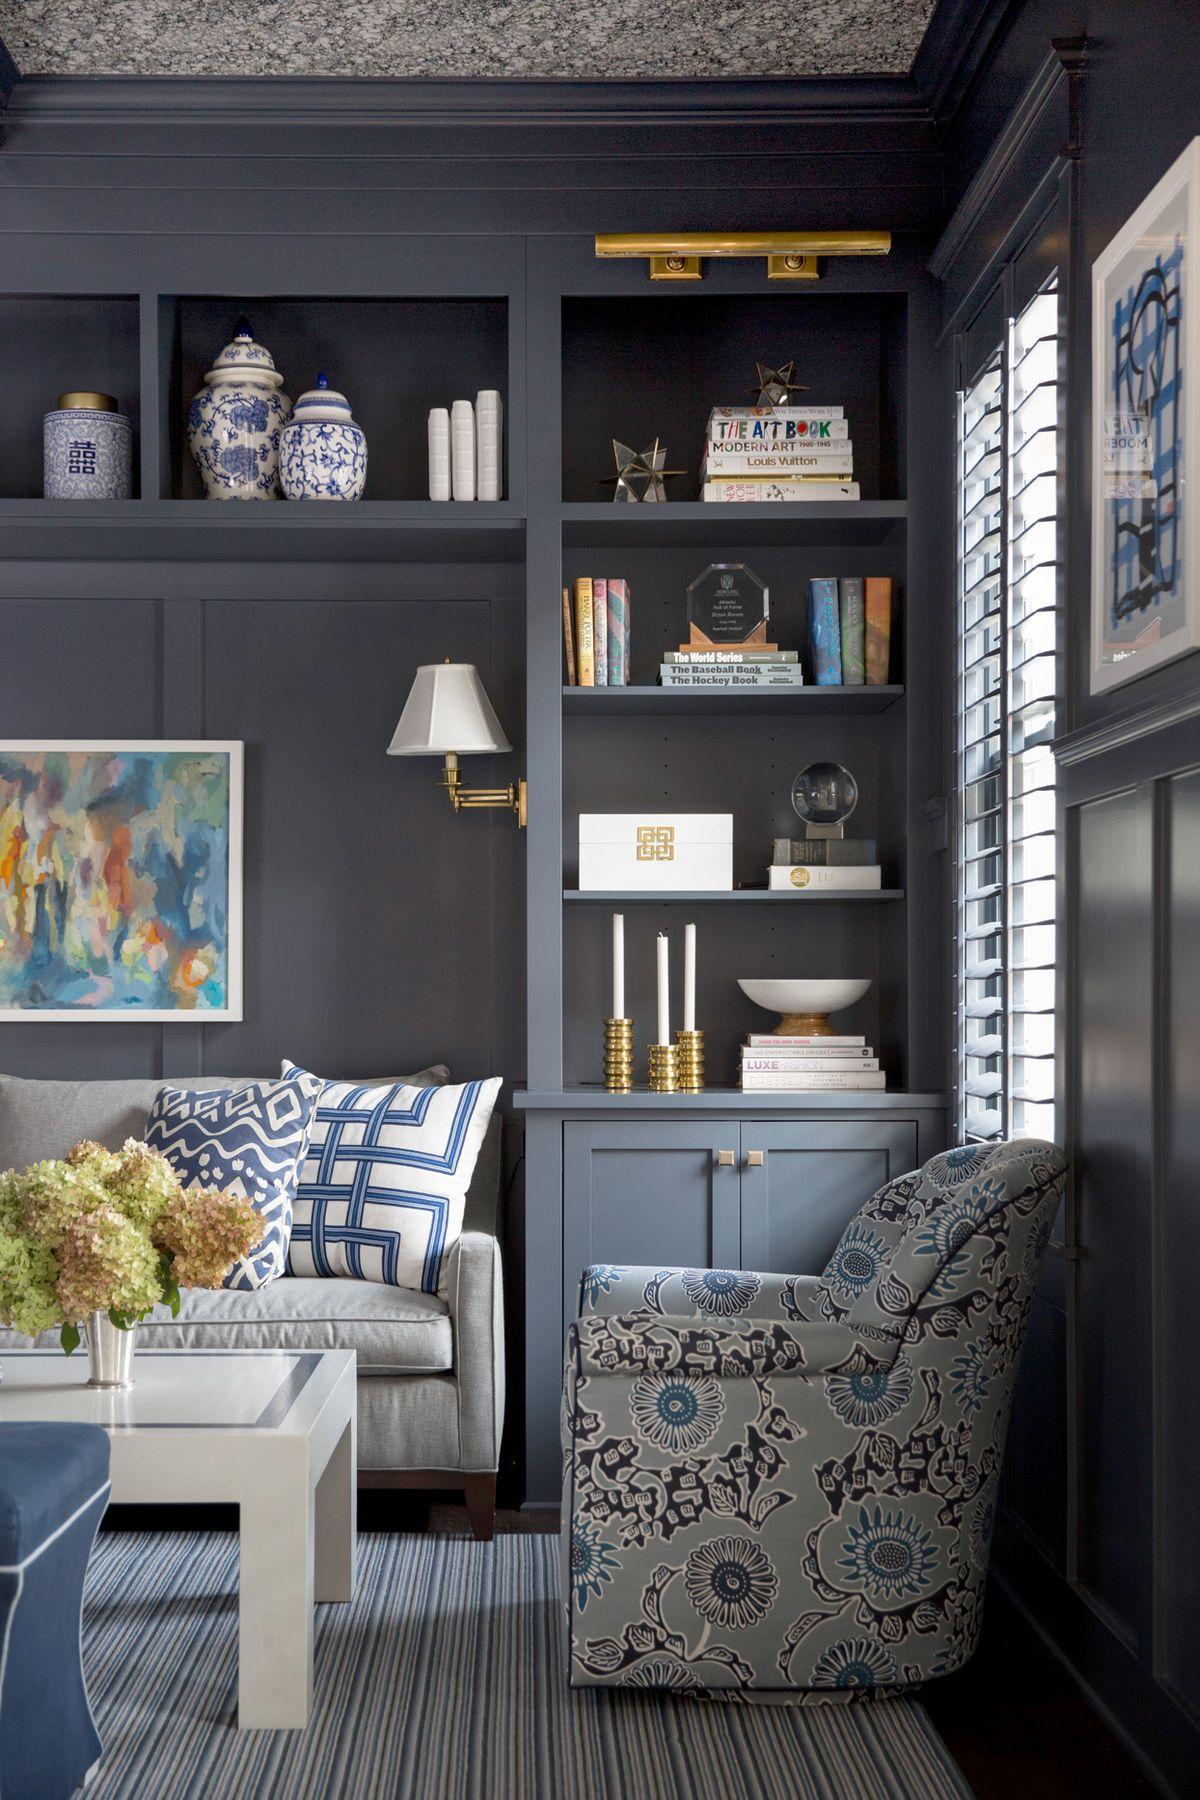 Our Favorite Bookshelf Organizing Ideas